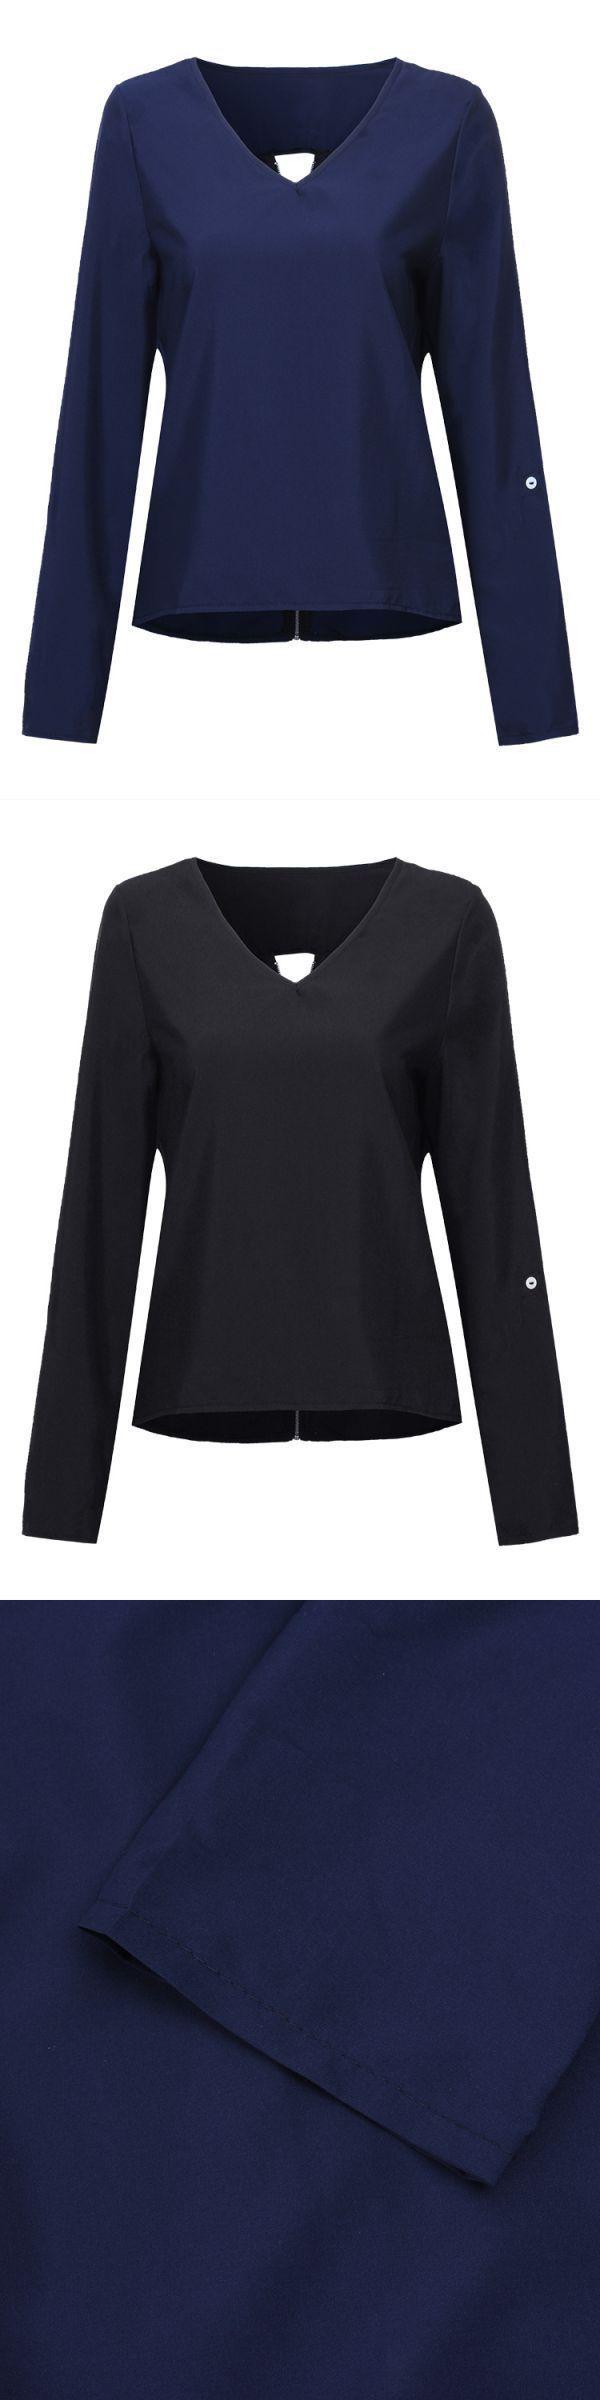 Casual women back zipper long sleeve v-neck t-shirts women#8217;s t shirts 3 4 sleeve #half #sleeve #t #shirts #womens #ku #womens #t #shirts #polo #t #shirts #womens #online #t #shirt #model #woman